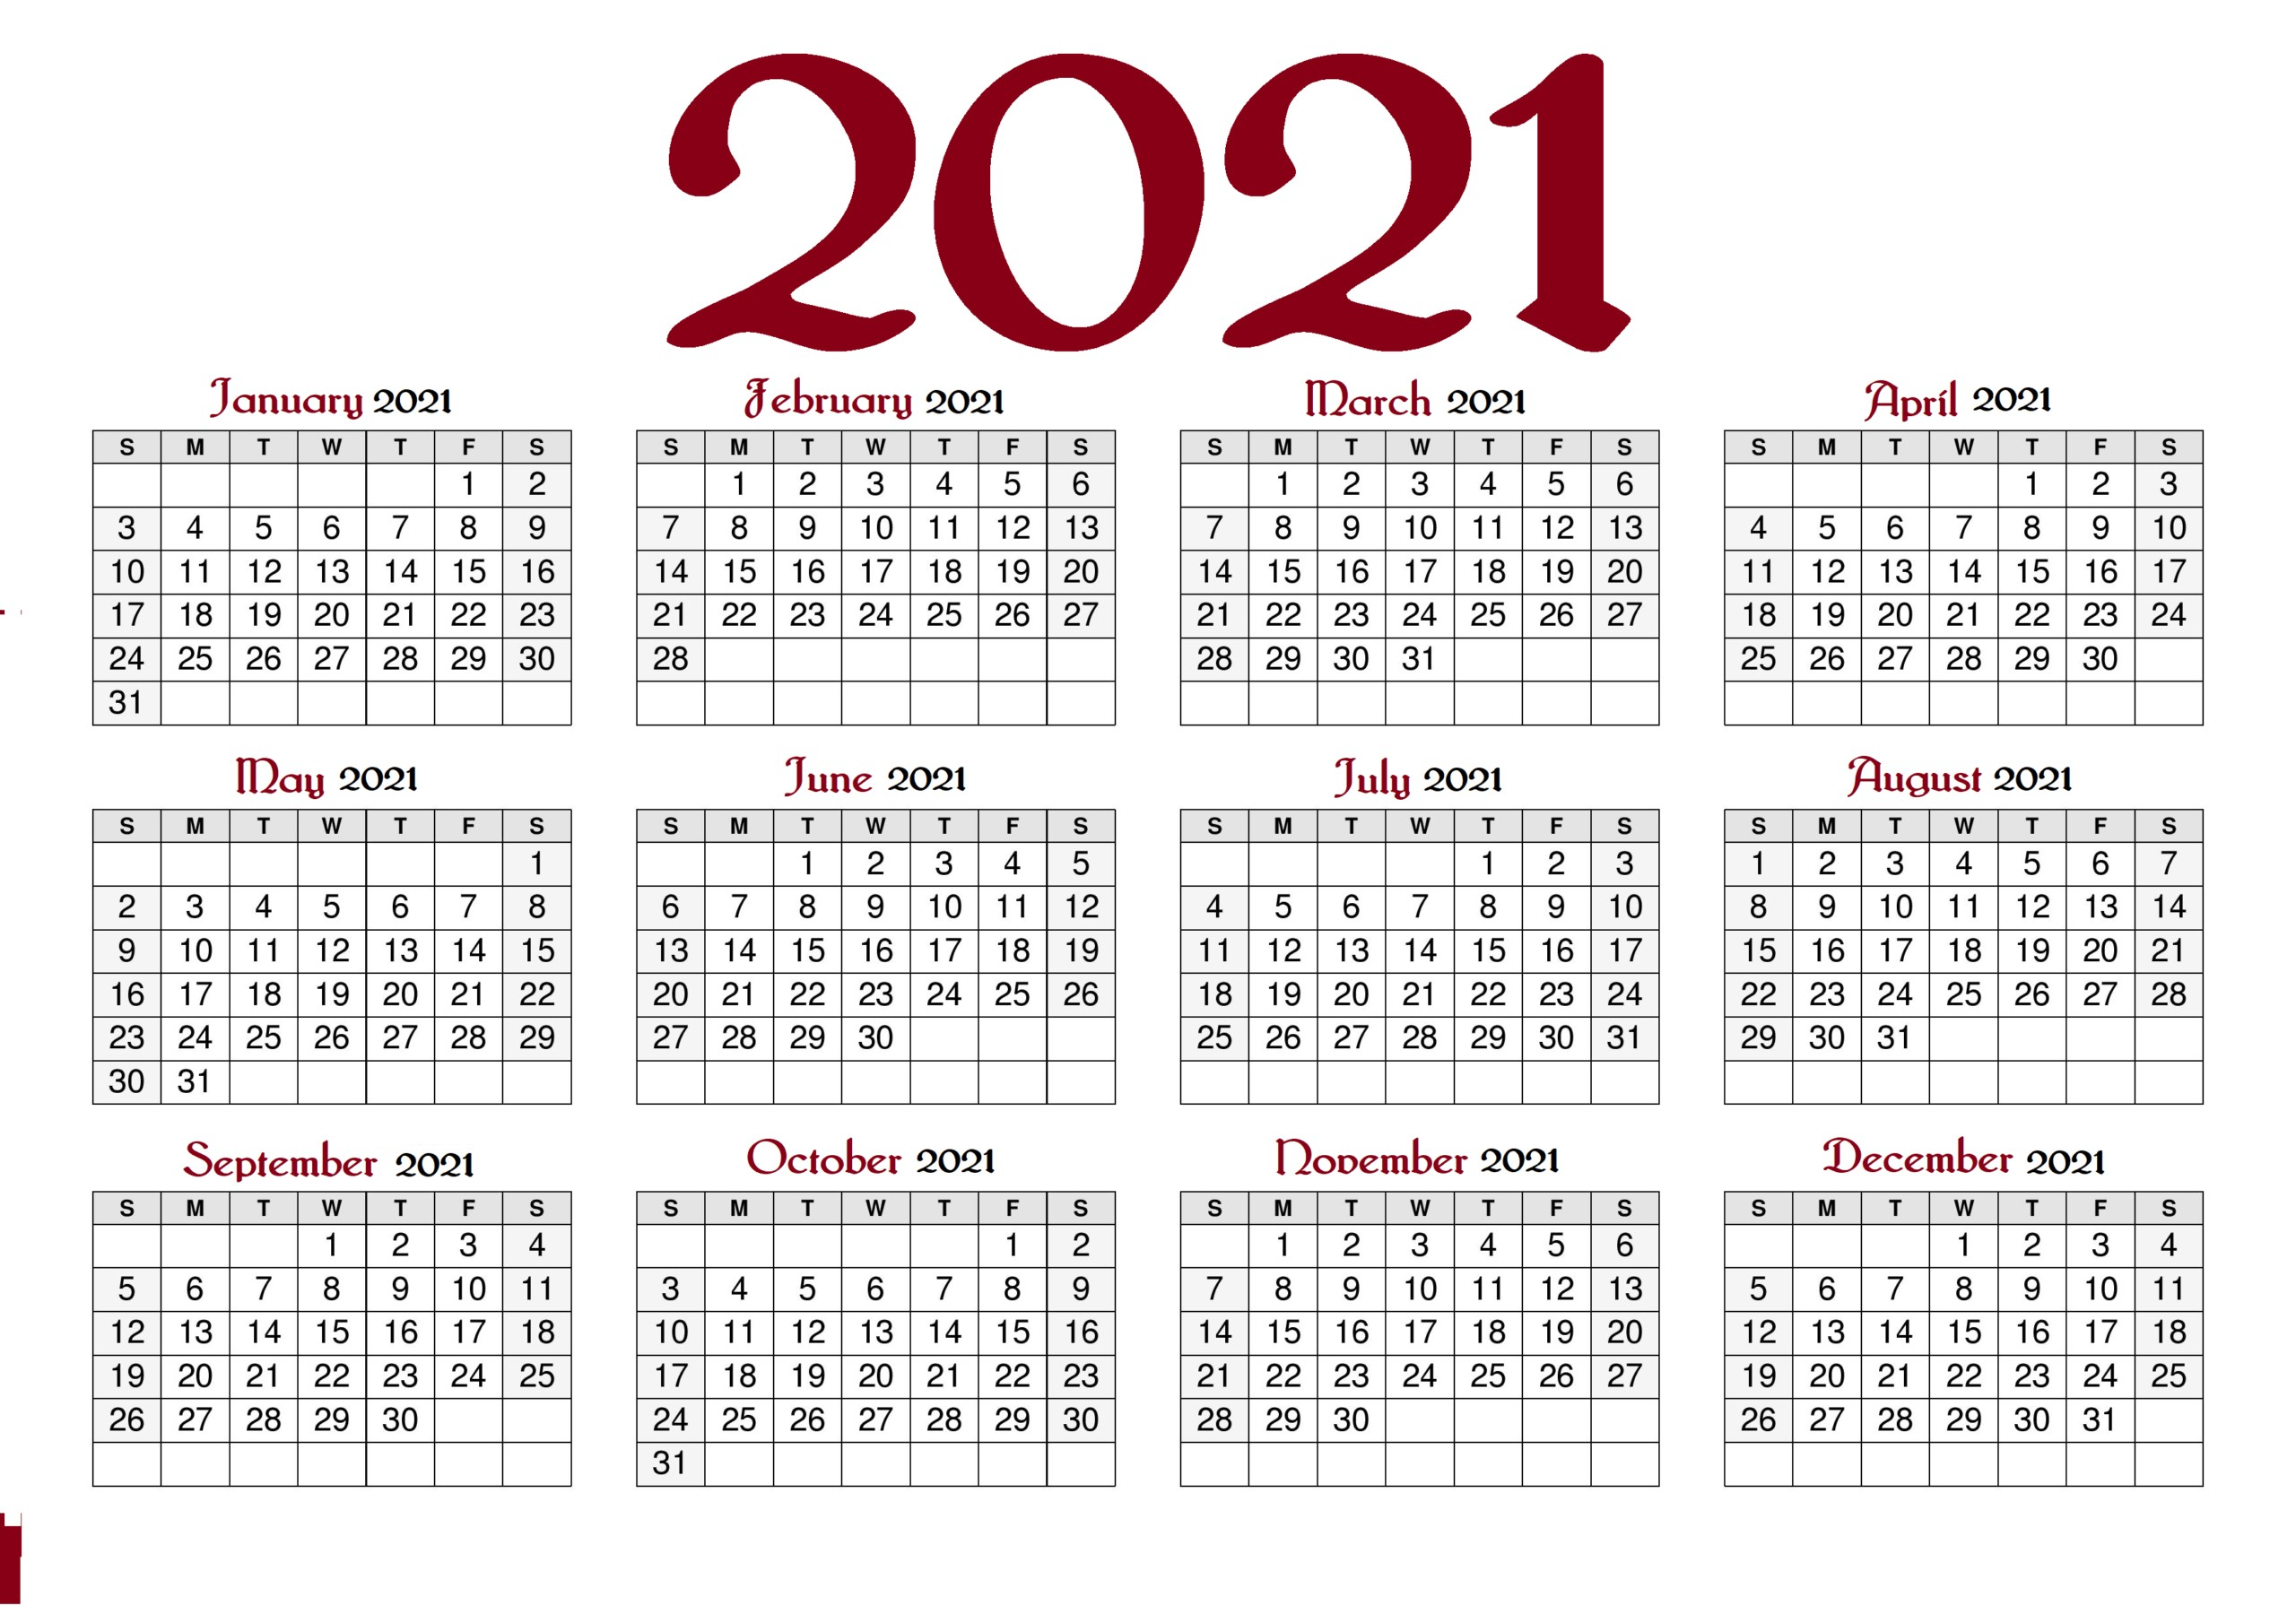 2021 Calendar With Holidays Printable With PDF